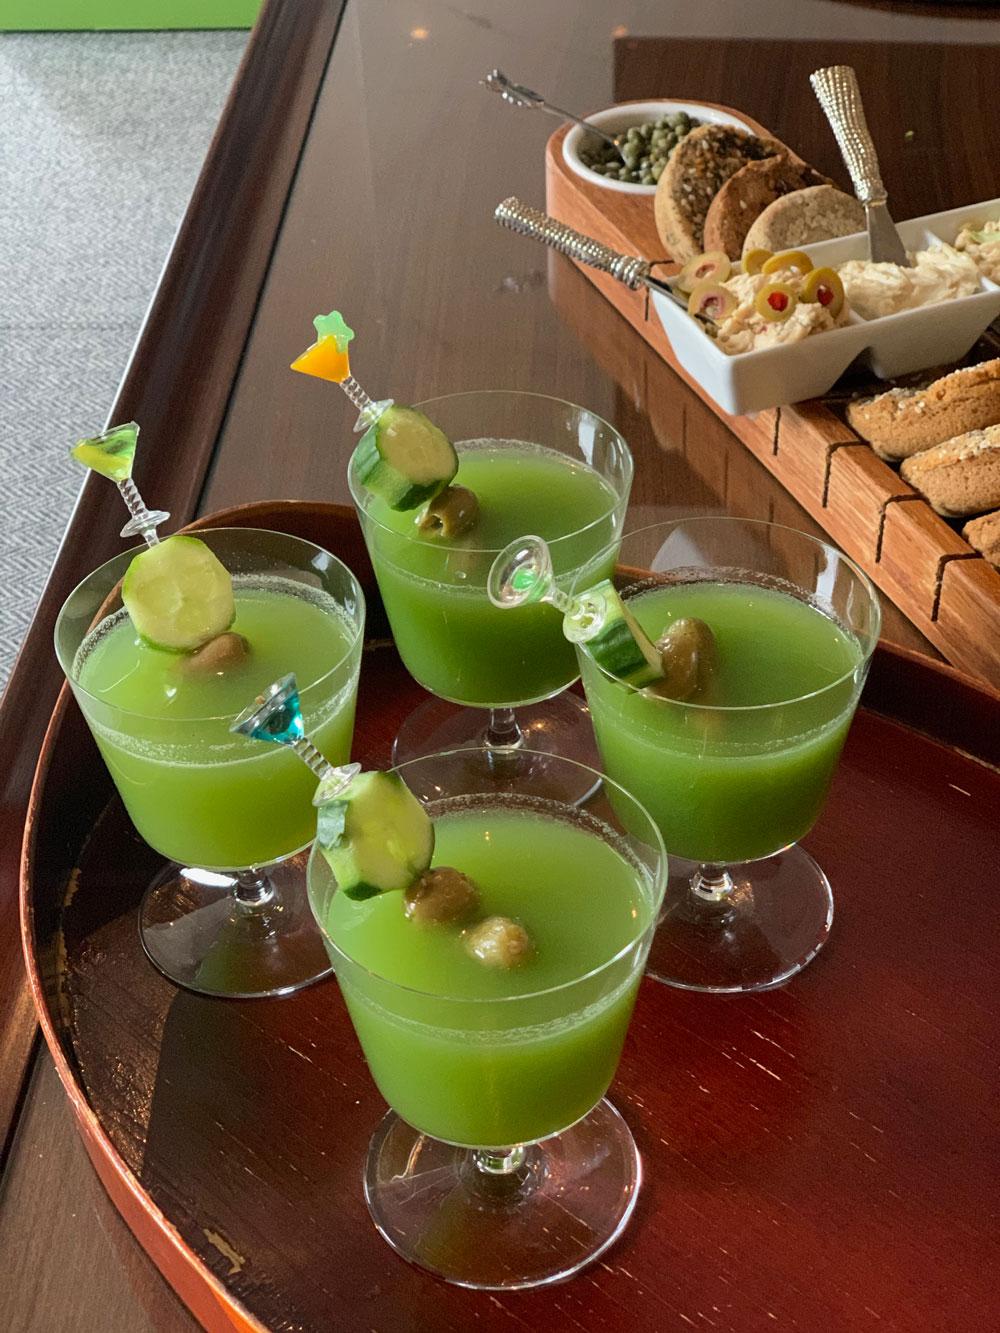 green-juice-groundsea-fitness-cleanse-detox-vegan